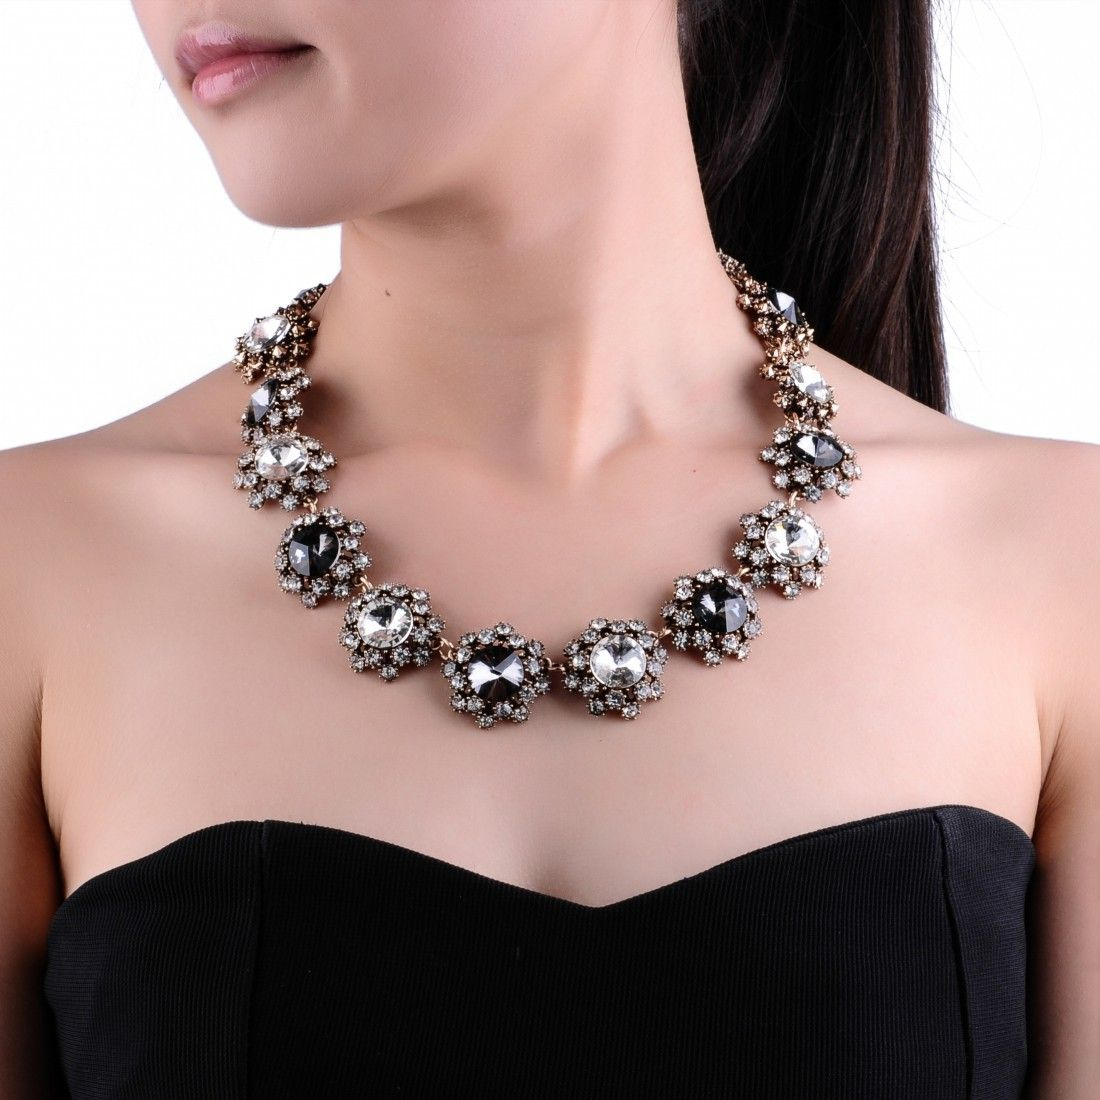 Fashion Charm Jewelry Grey Mix old golden color Glass Rhinestone Statement Bib Choker Necklace [N0008656] - $5.66 : FindJewel.comFindJewel.com,discount code :pp 12% off. no minimum order.welcome deadline is Feb.12th